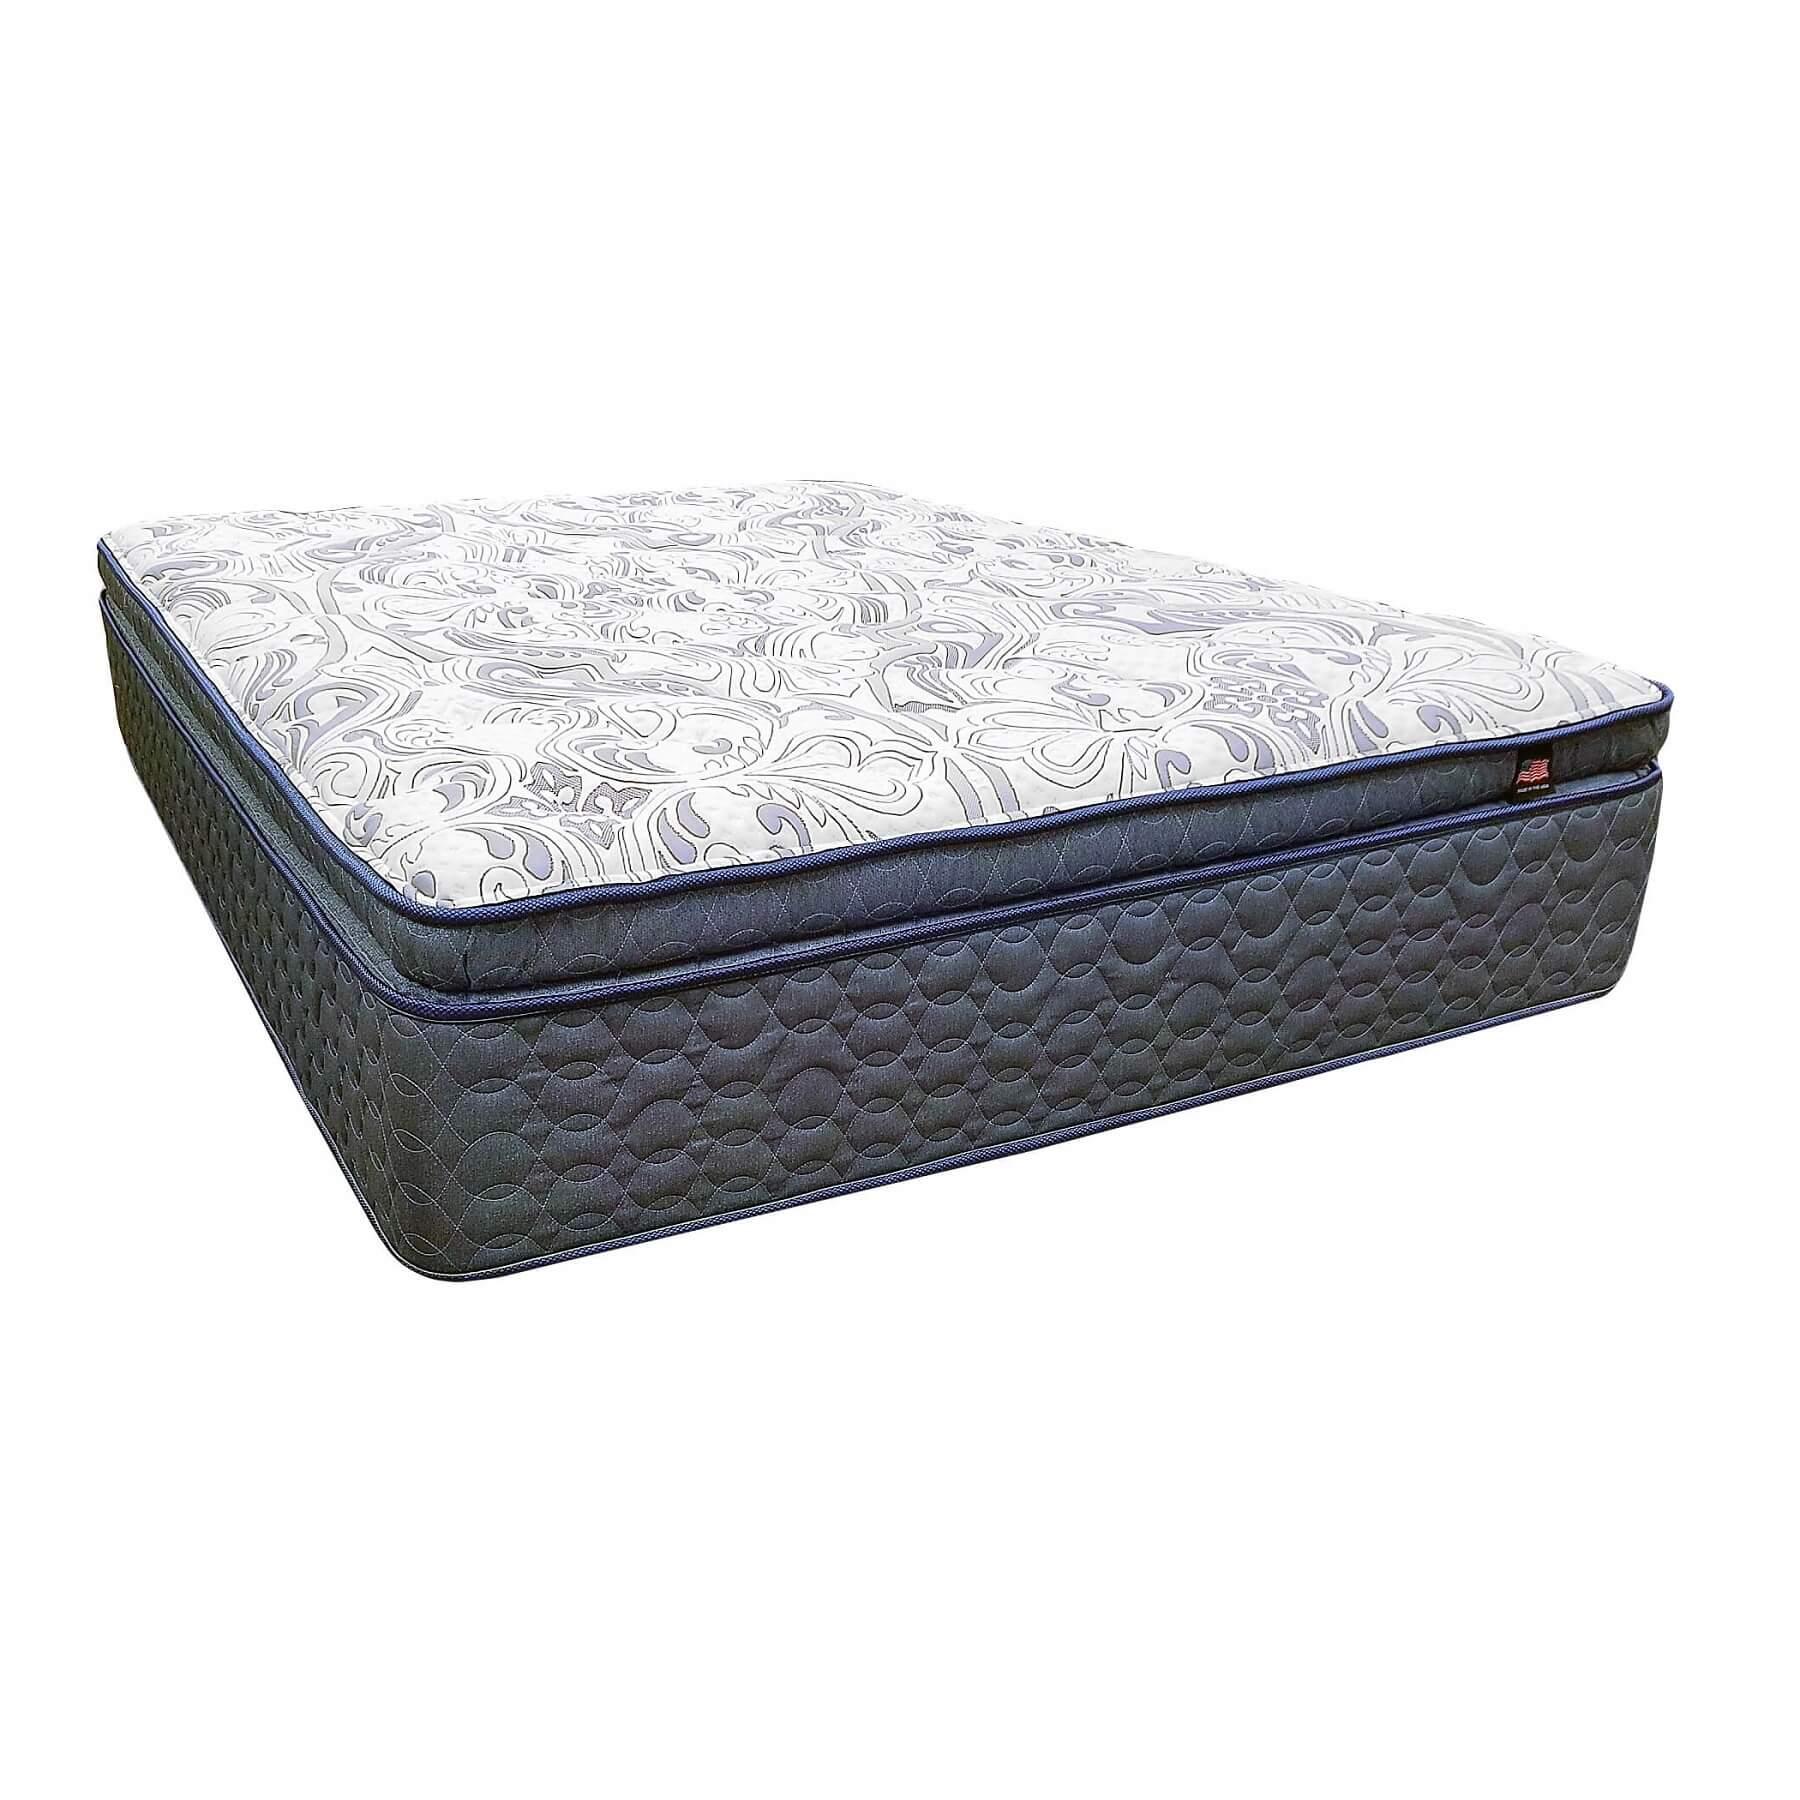 Independence Pillow Top Full Mattress